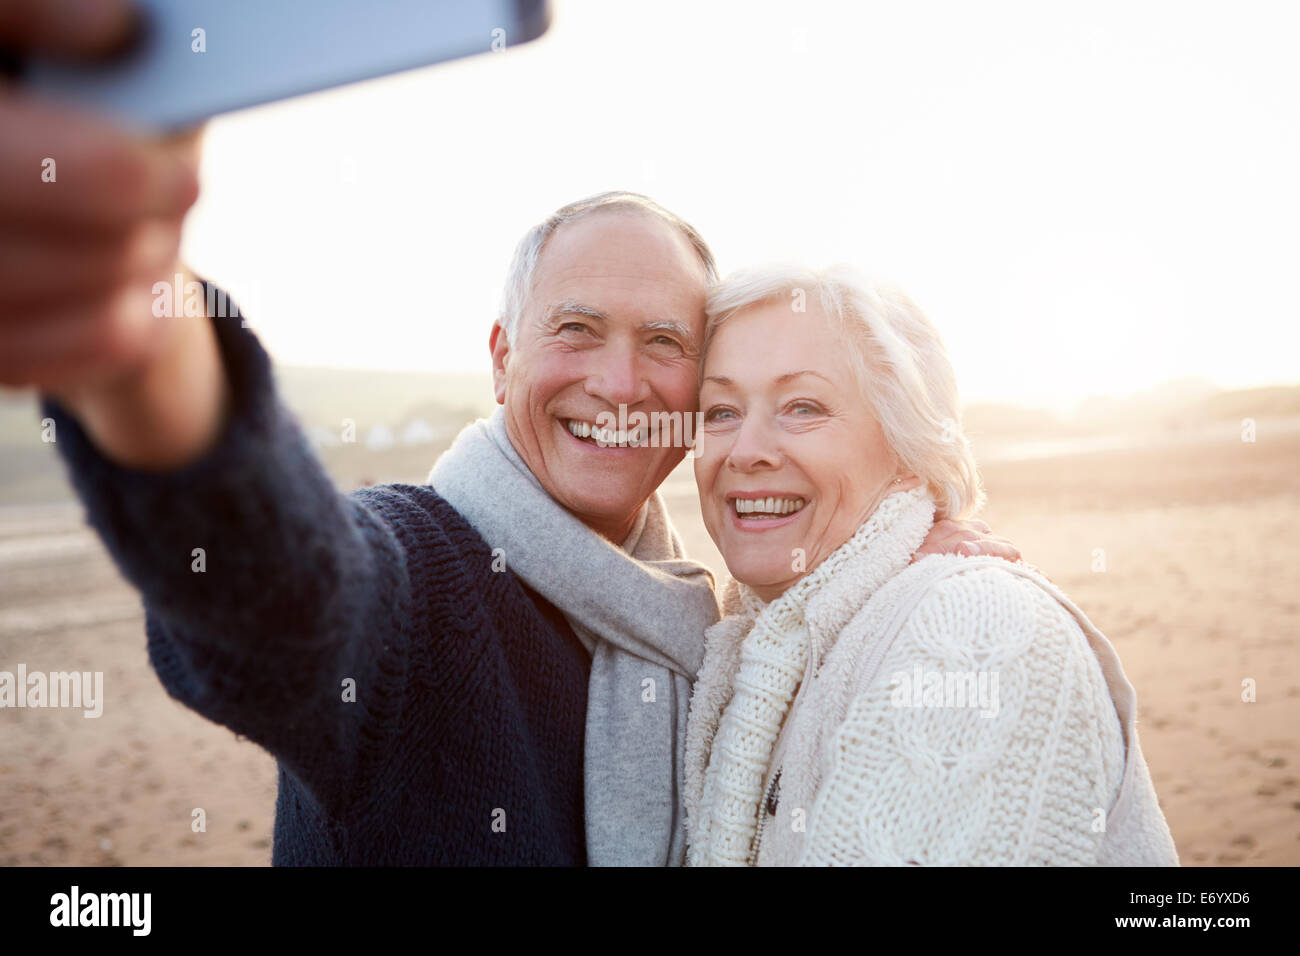 Senior Couple Standing On Beach Taking Selfie - Stock Image